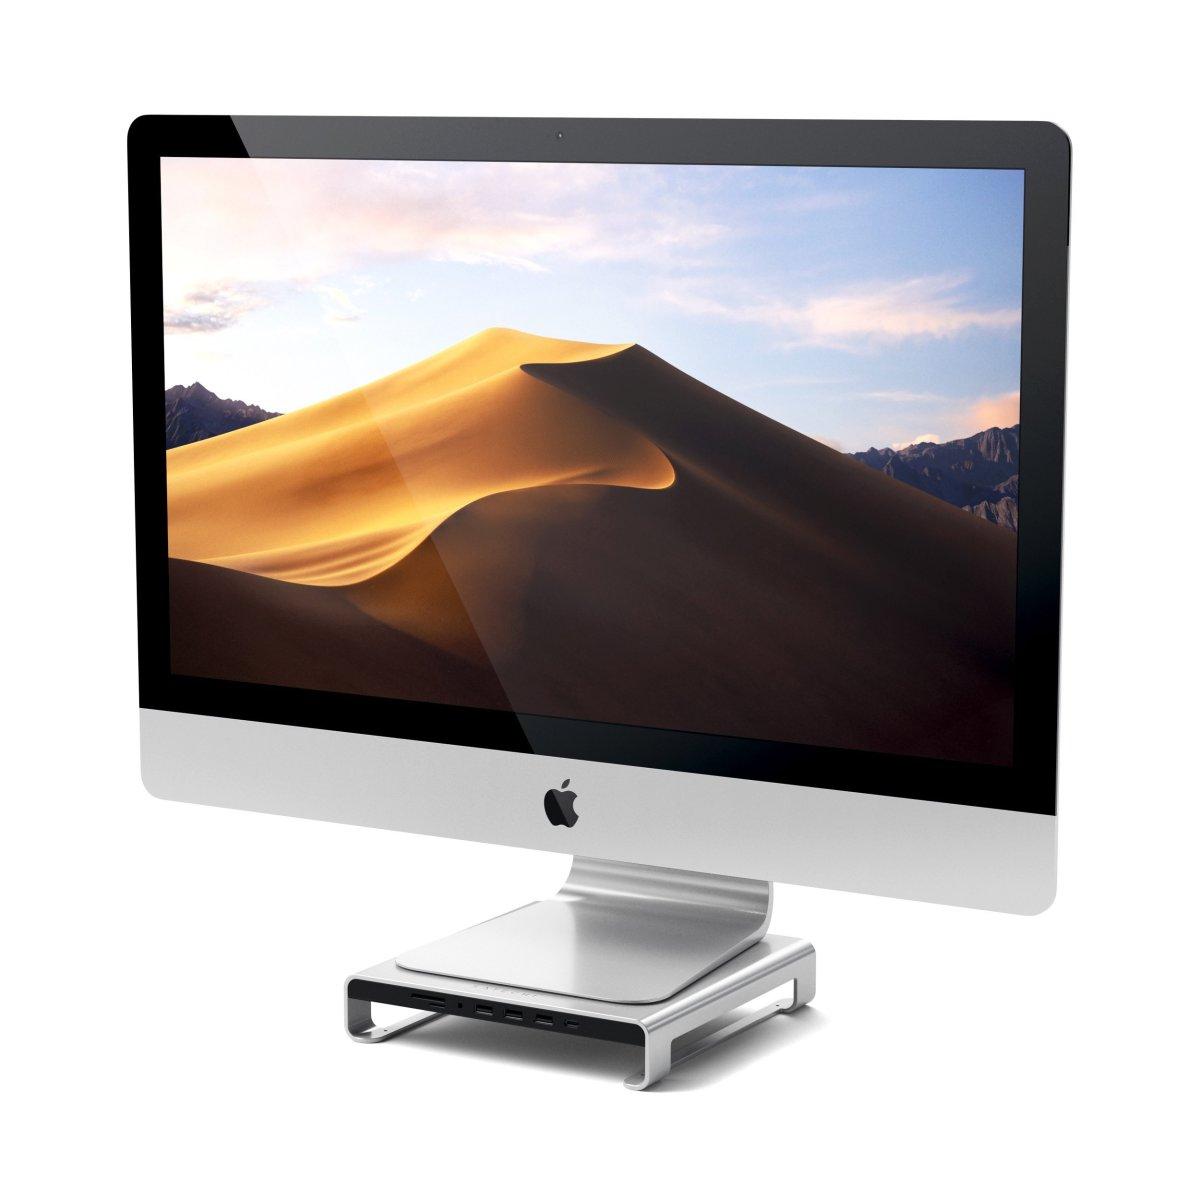 SATECHI_iMac_Stand_SILVER_9